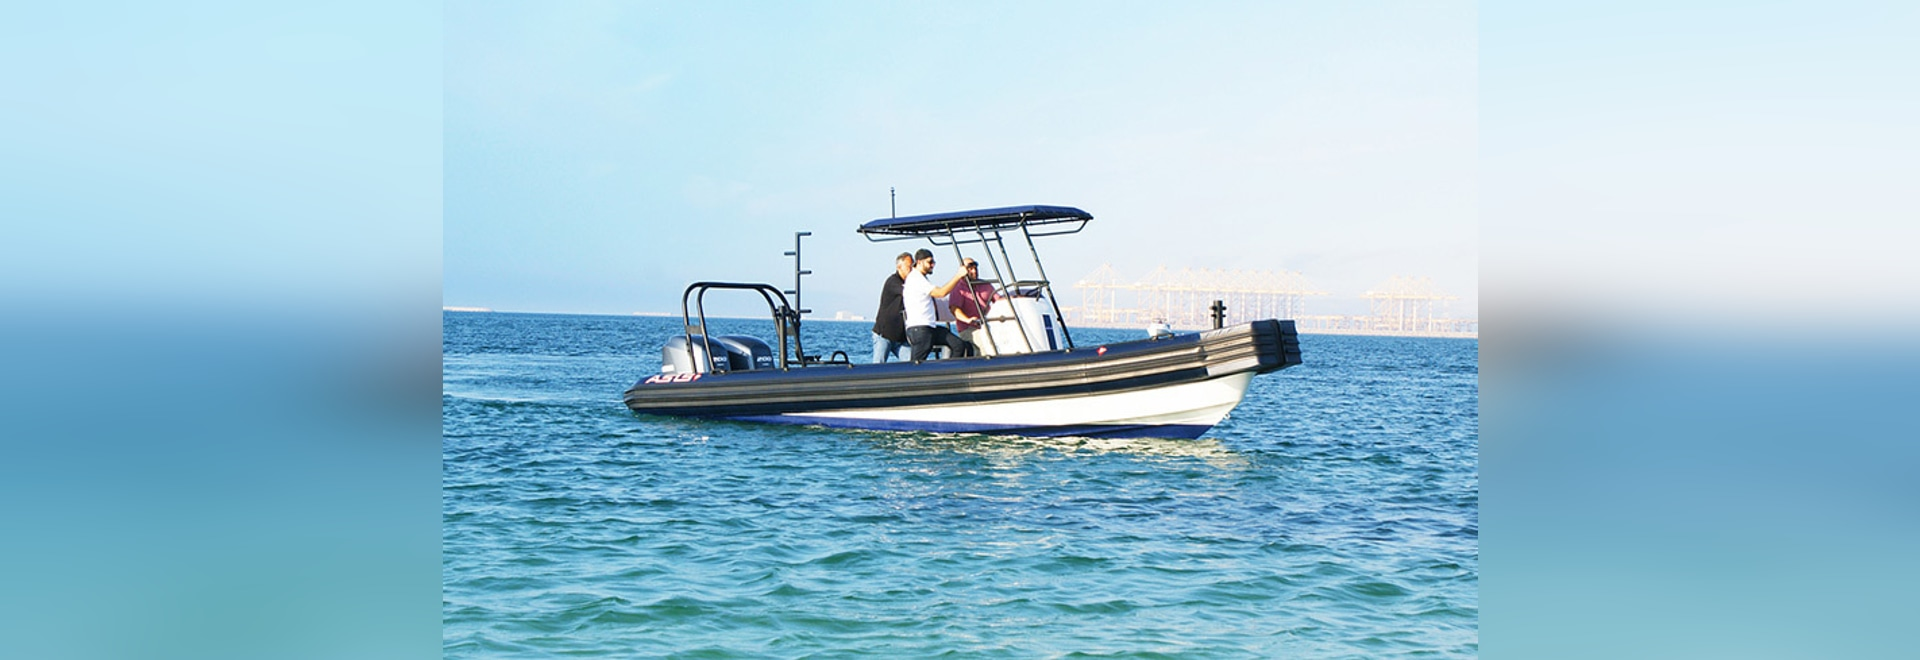 Marina Operations Rigid Inflatable Boat